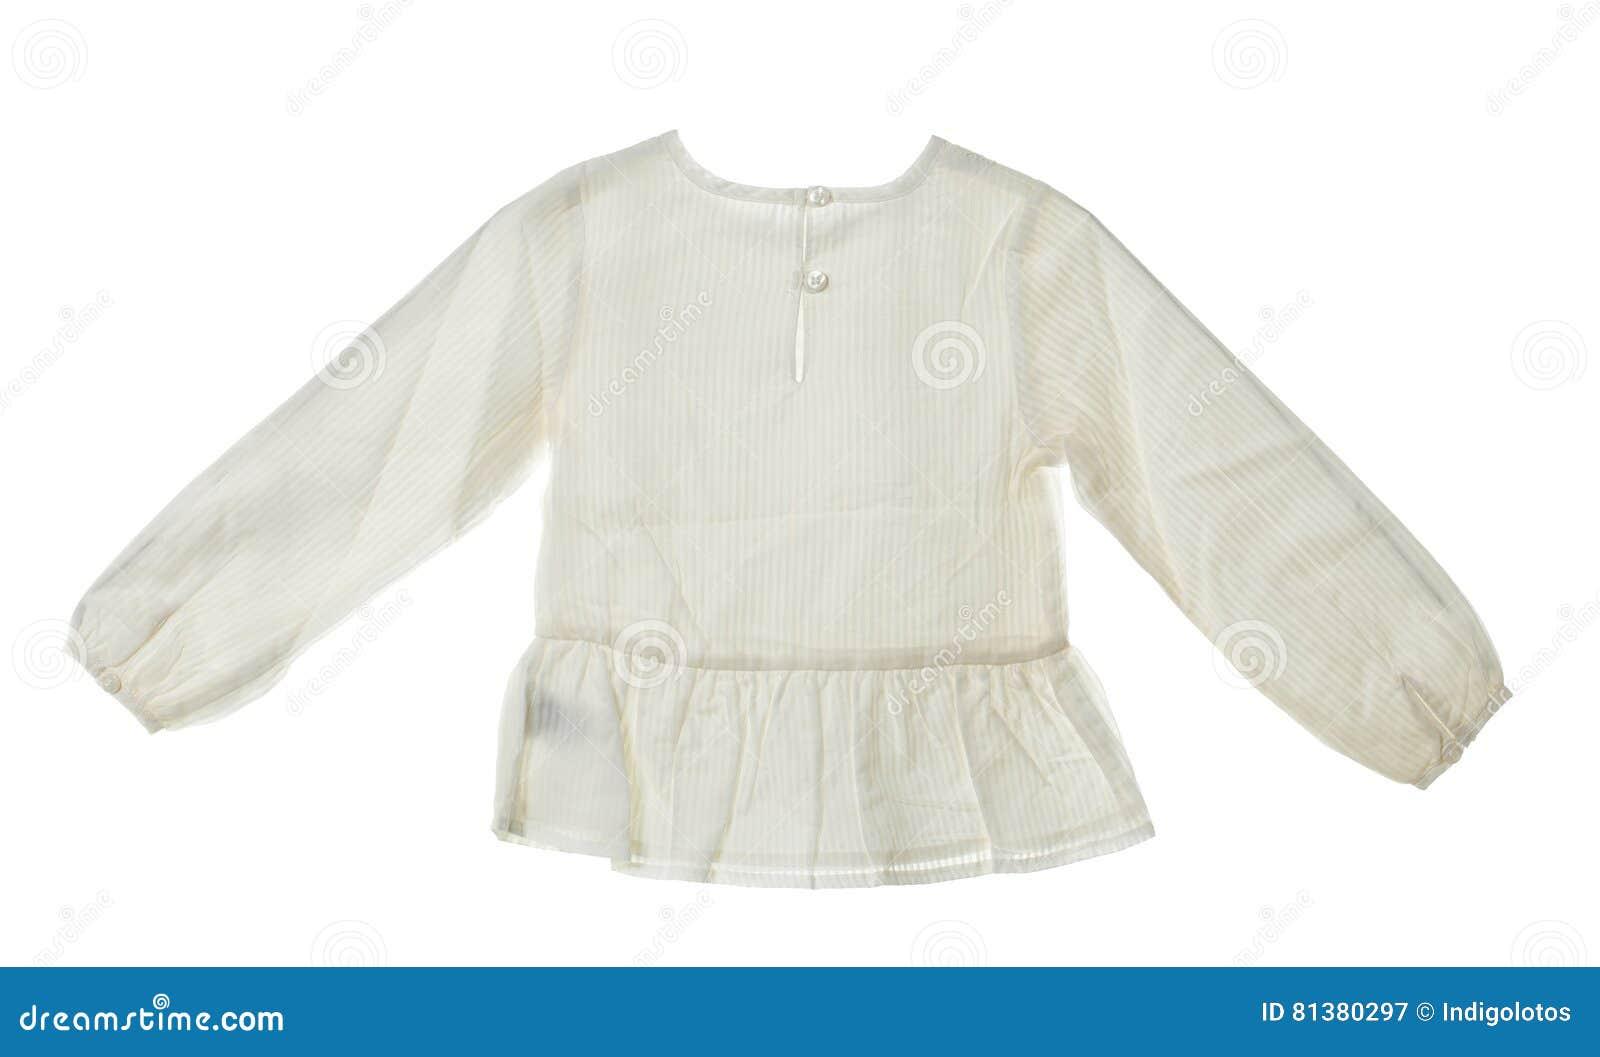 pretty nice 39707 09ce4 Blusa Di Seta Bianca Elegante Immagine Stock - Immagine di ...